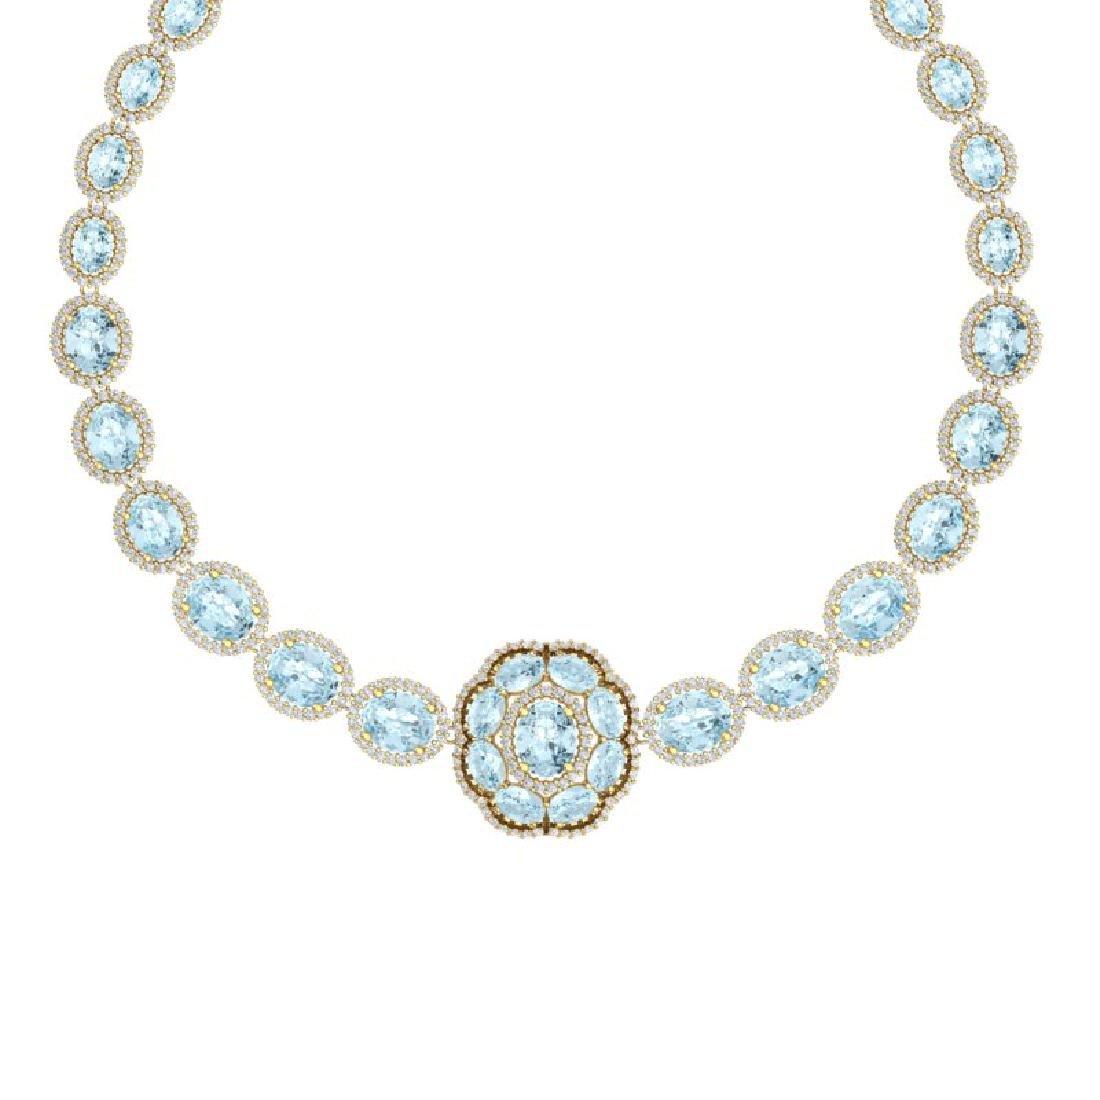 52.67 CTW Royalty Sky Topaz & VS Diamond Necklace 18K